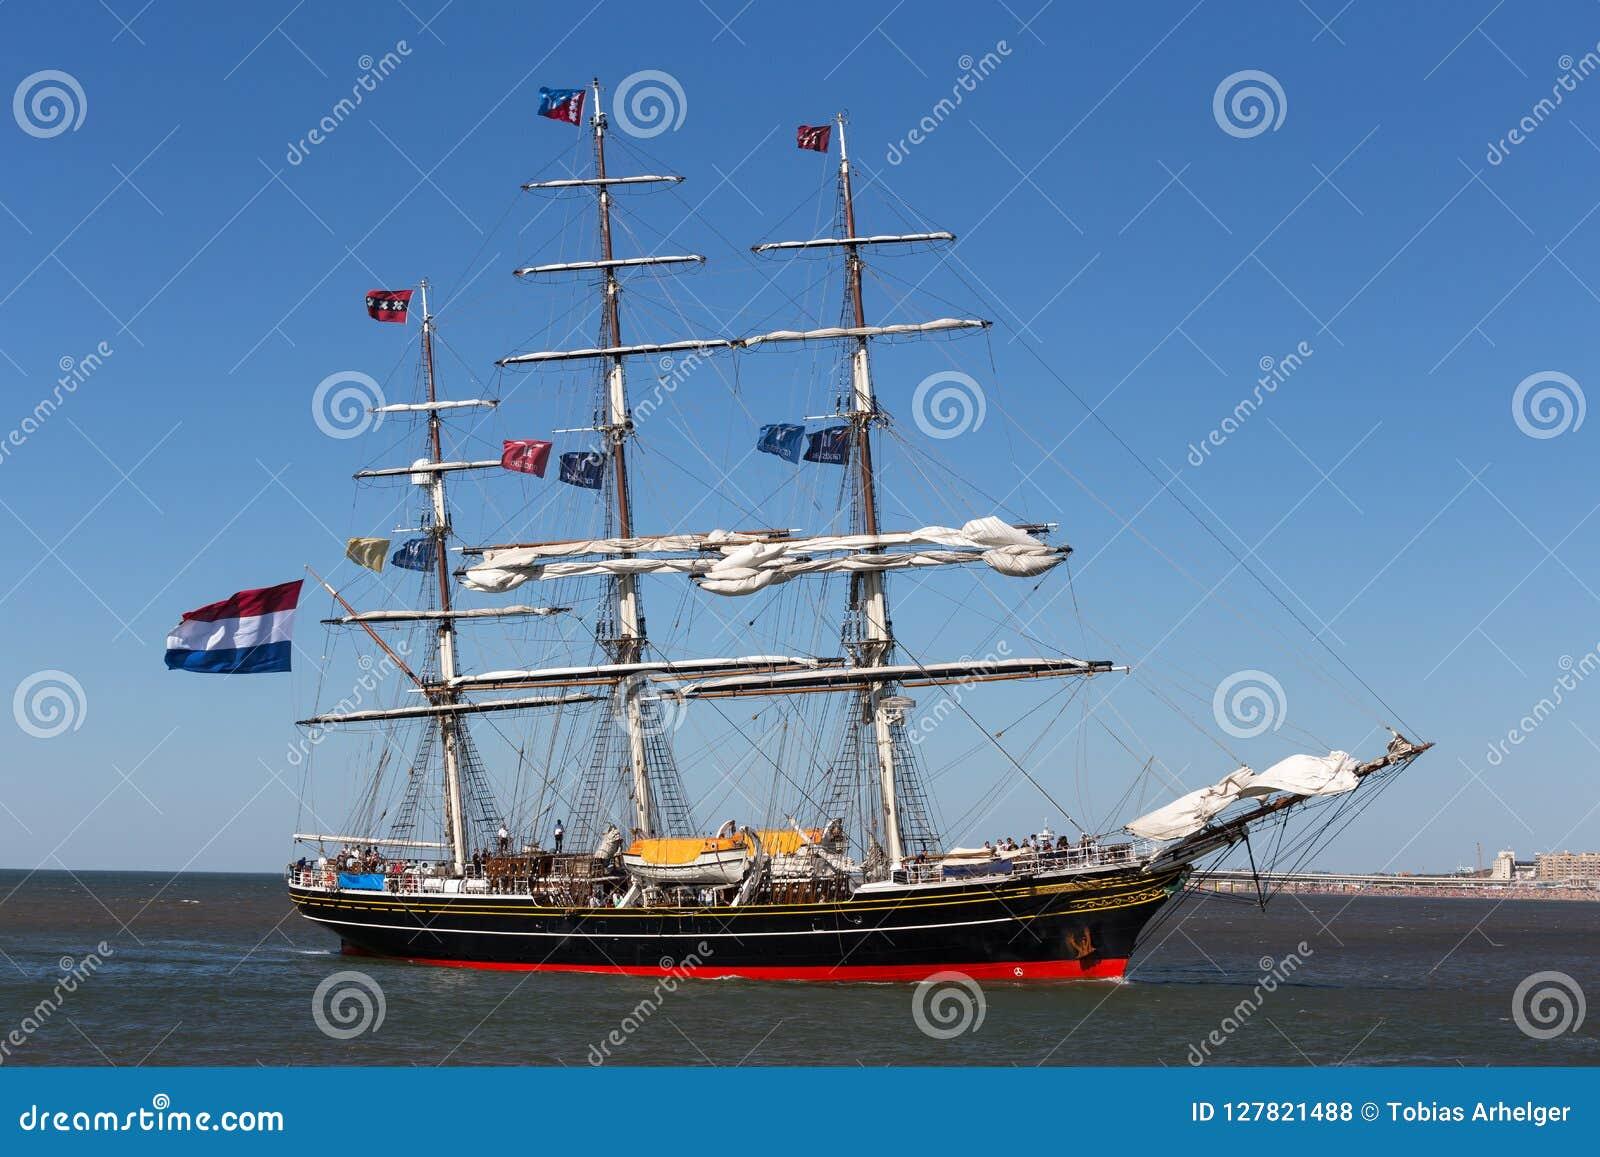 The hague, the hague/netherlands - 01 07 18: sailing ship stad amsterdam on the ocean the hague netherlands